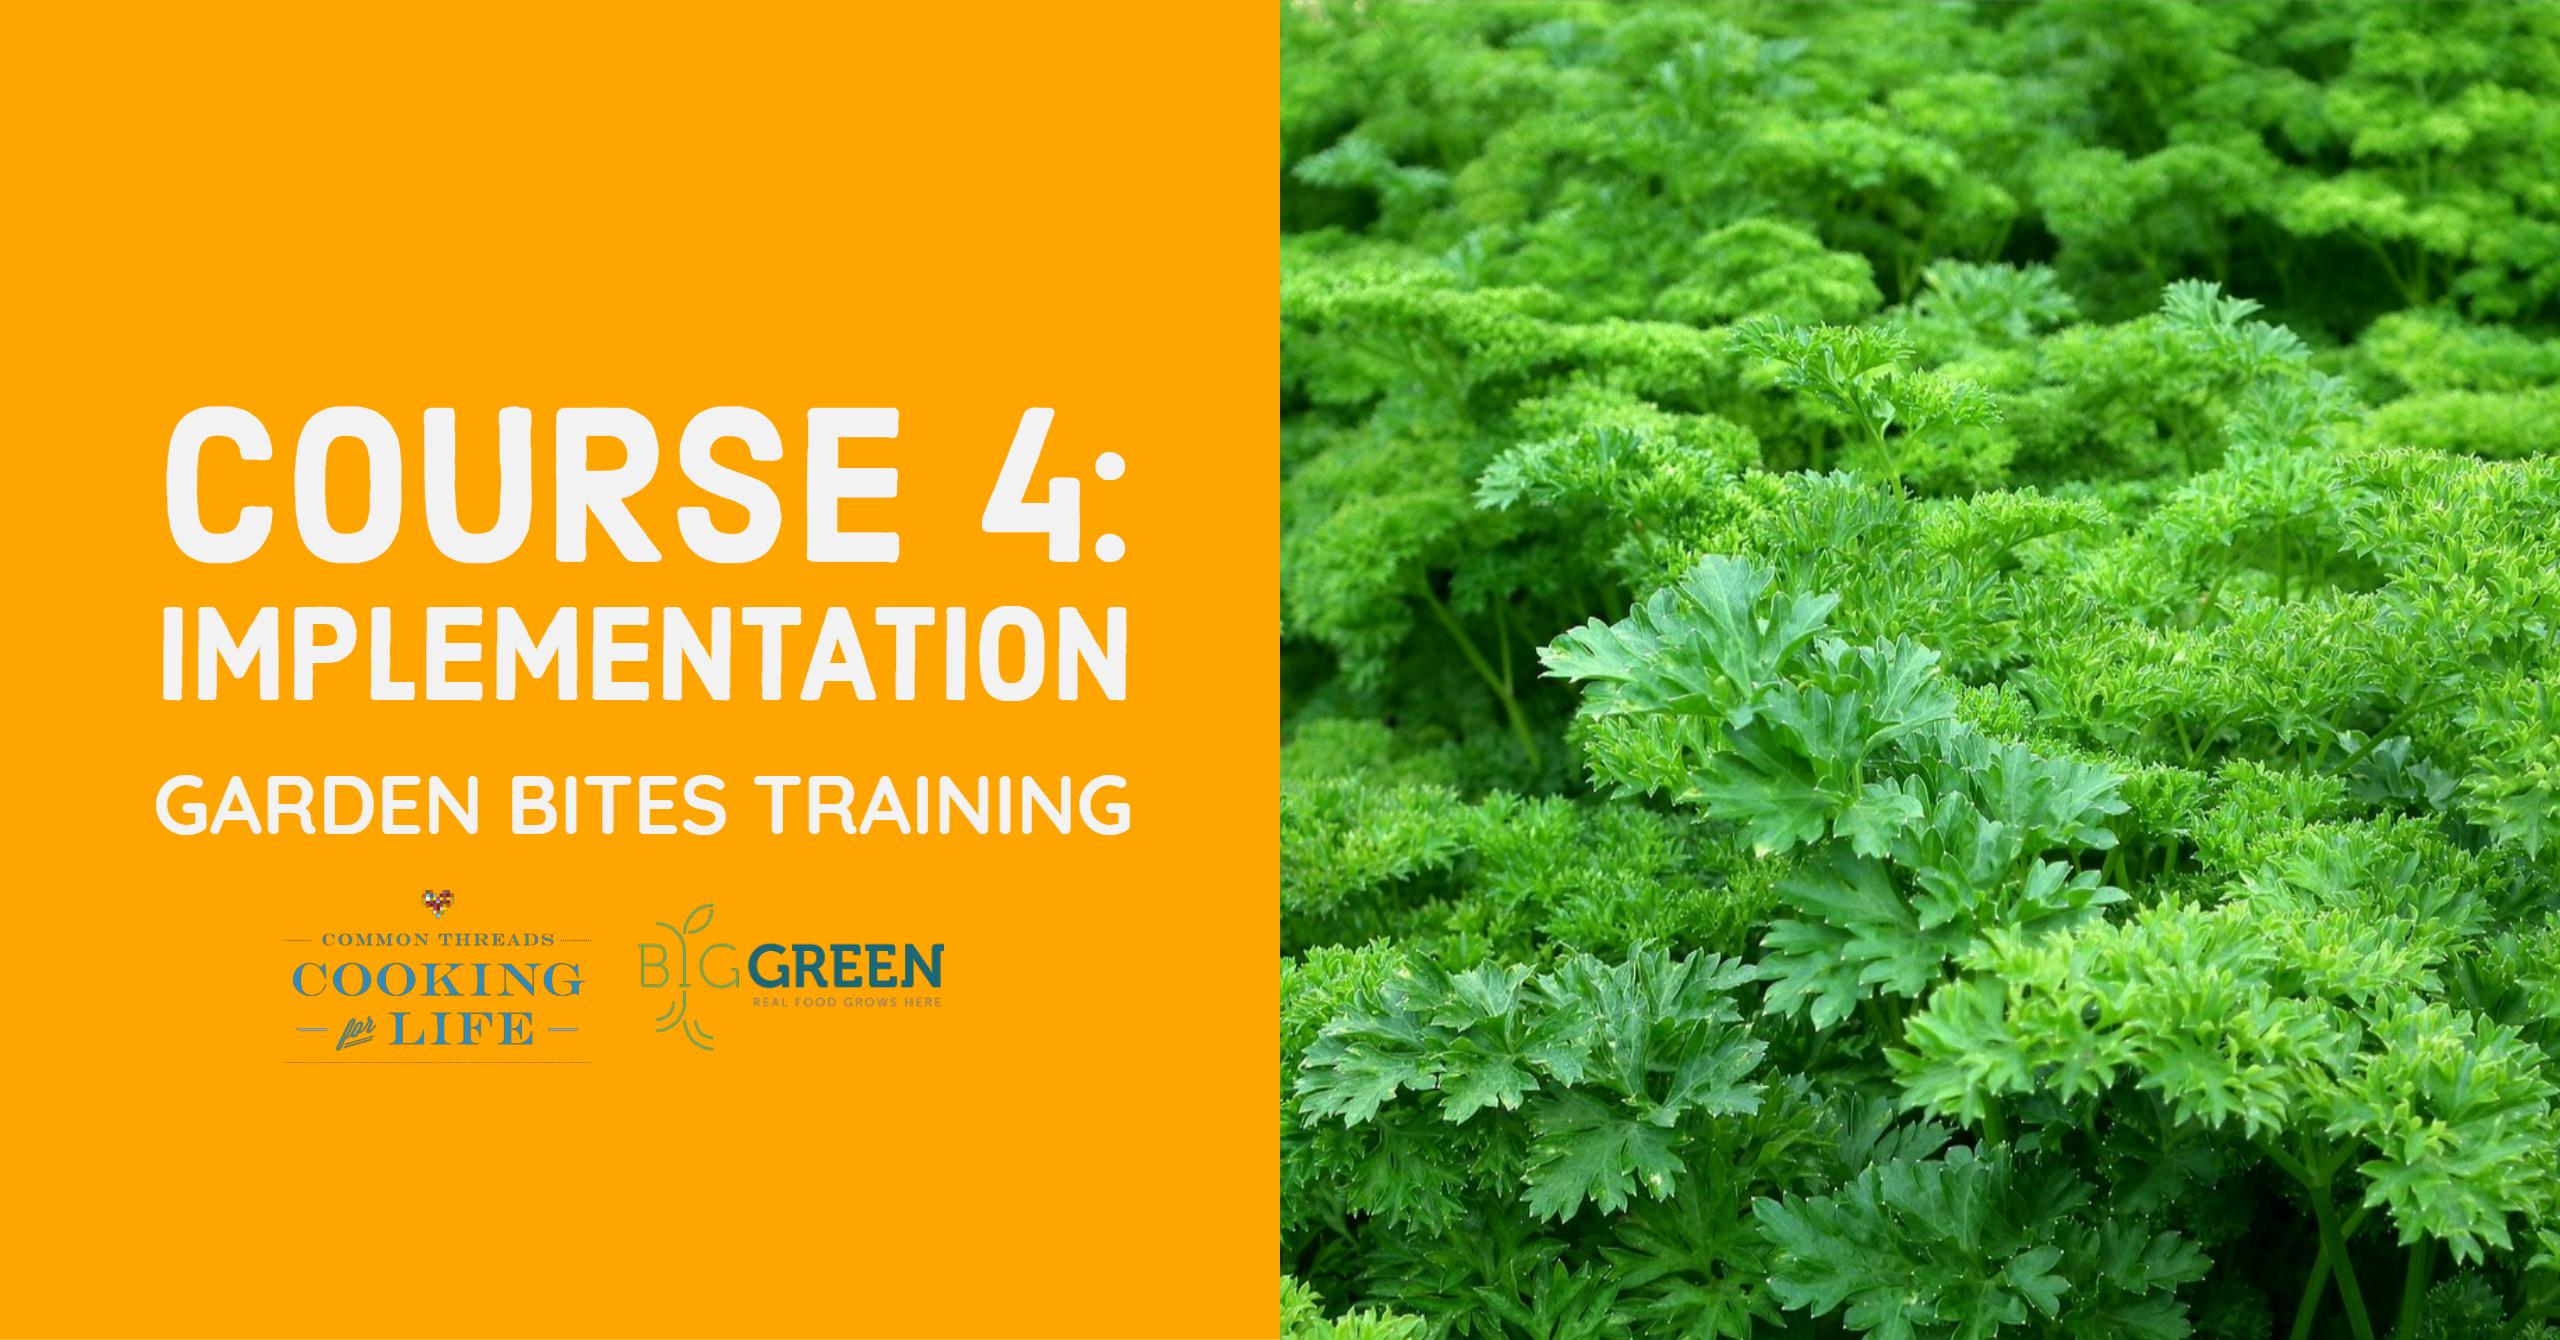 Garden Bites Training for CT: Implementation Logistics